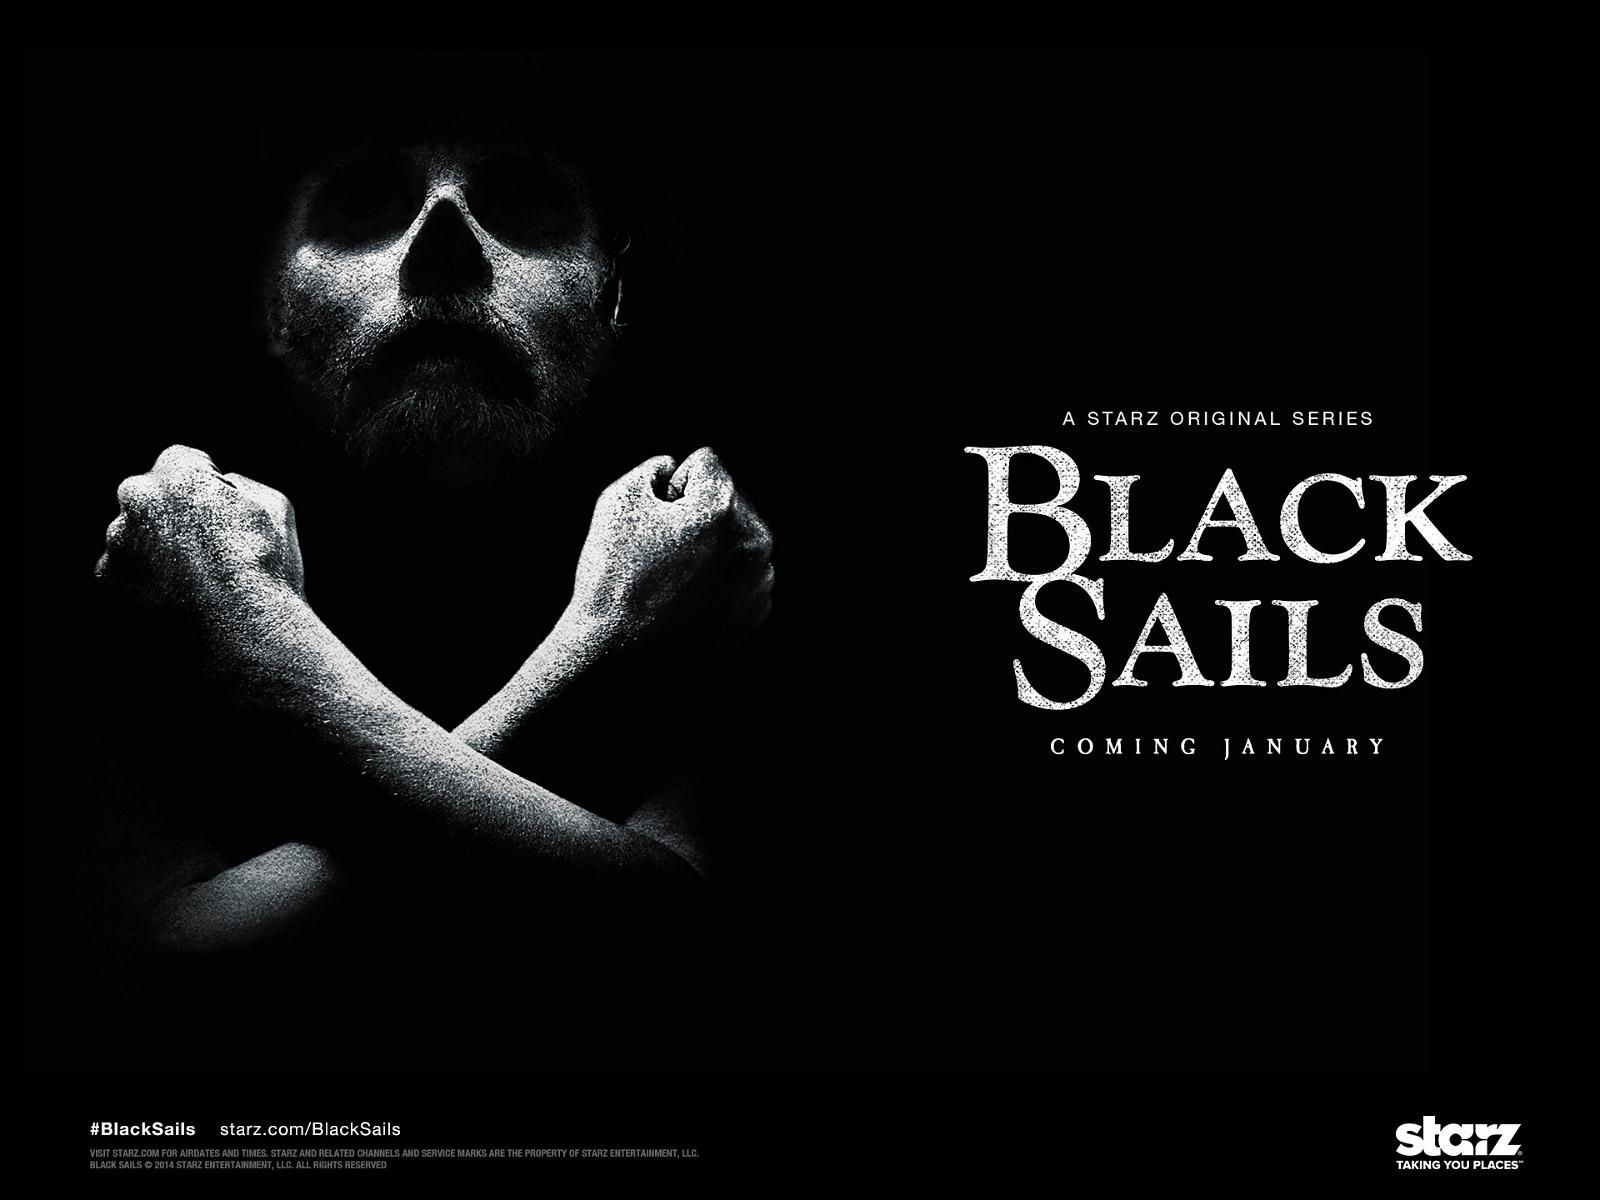 Black Sails Season 01 | S01E01-E08 HDTV Fh35